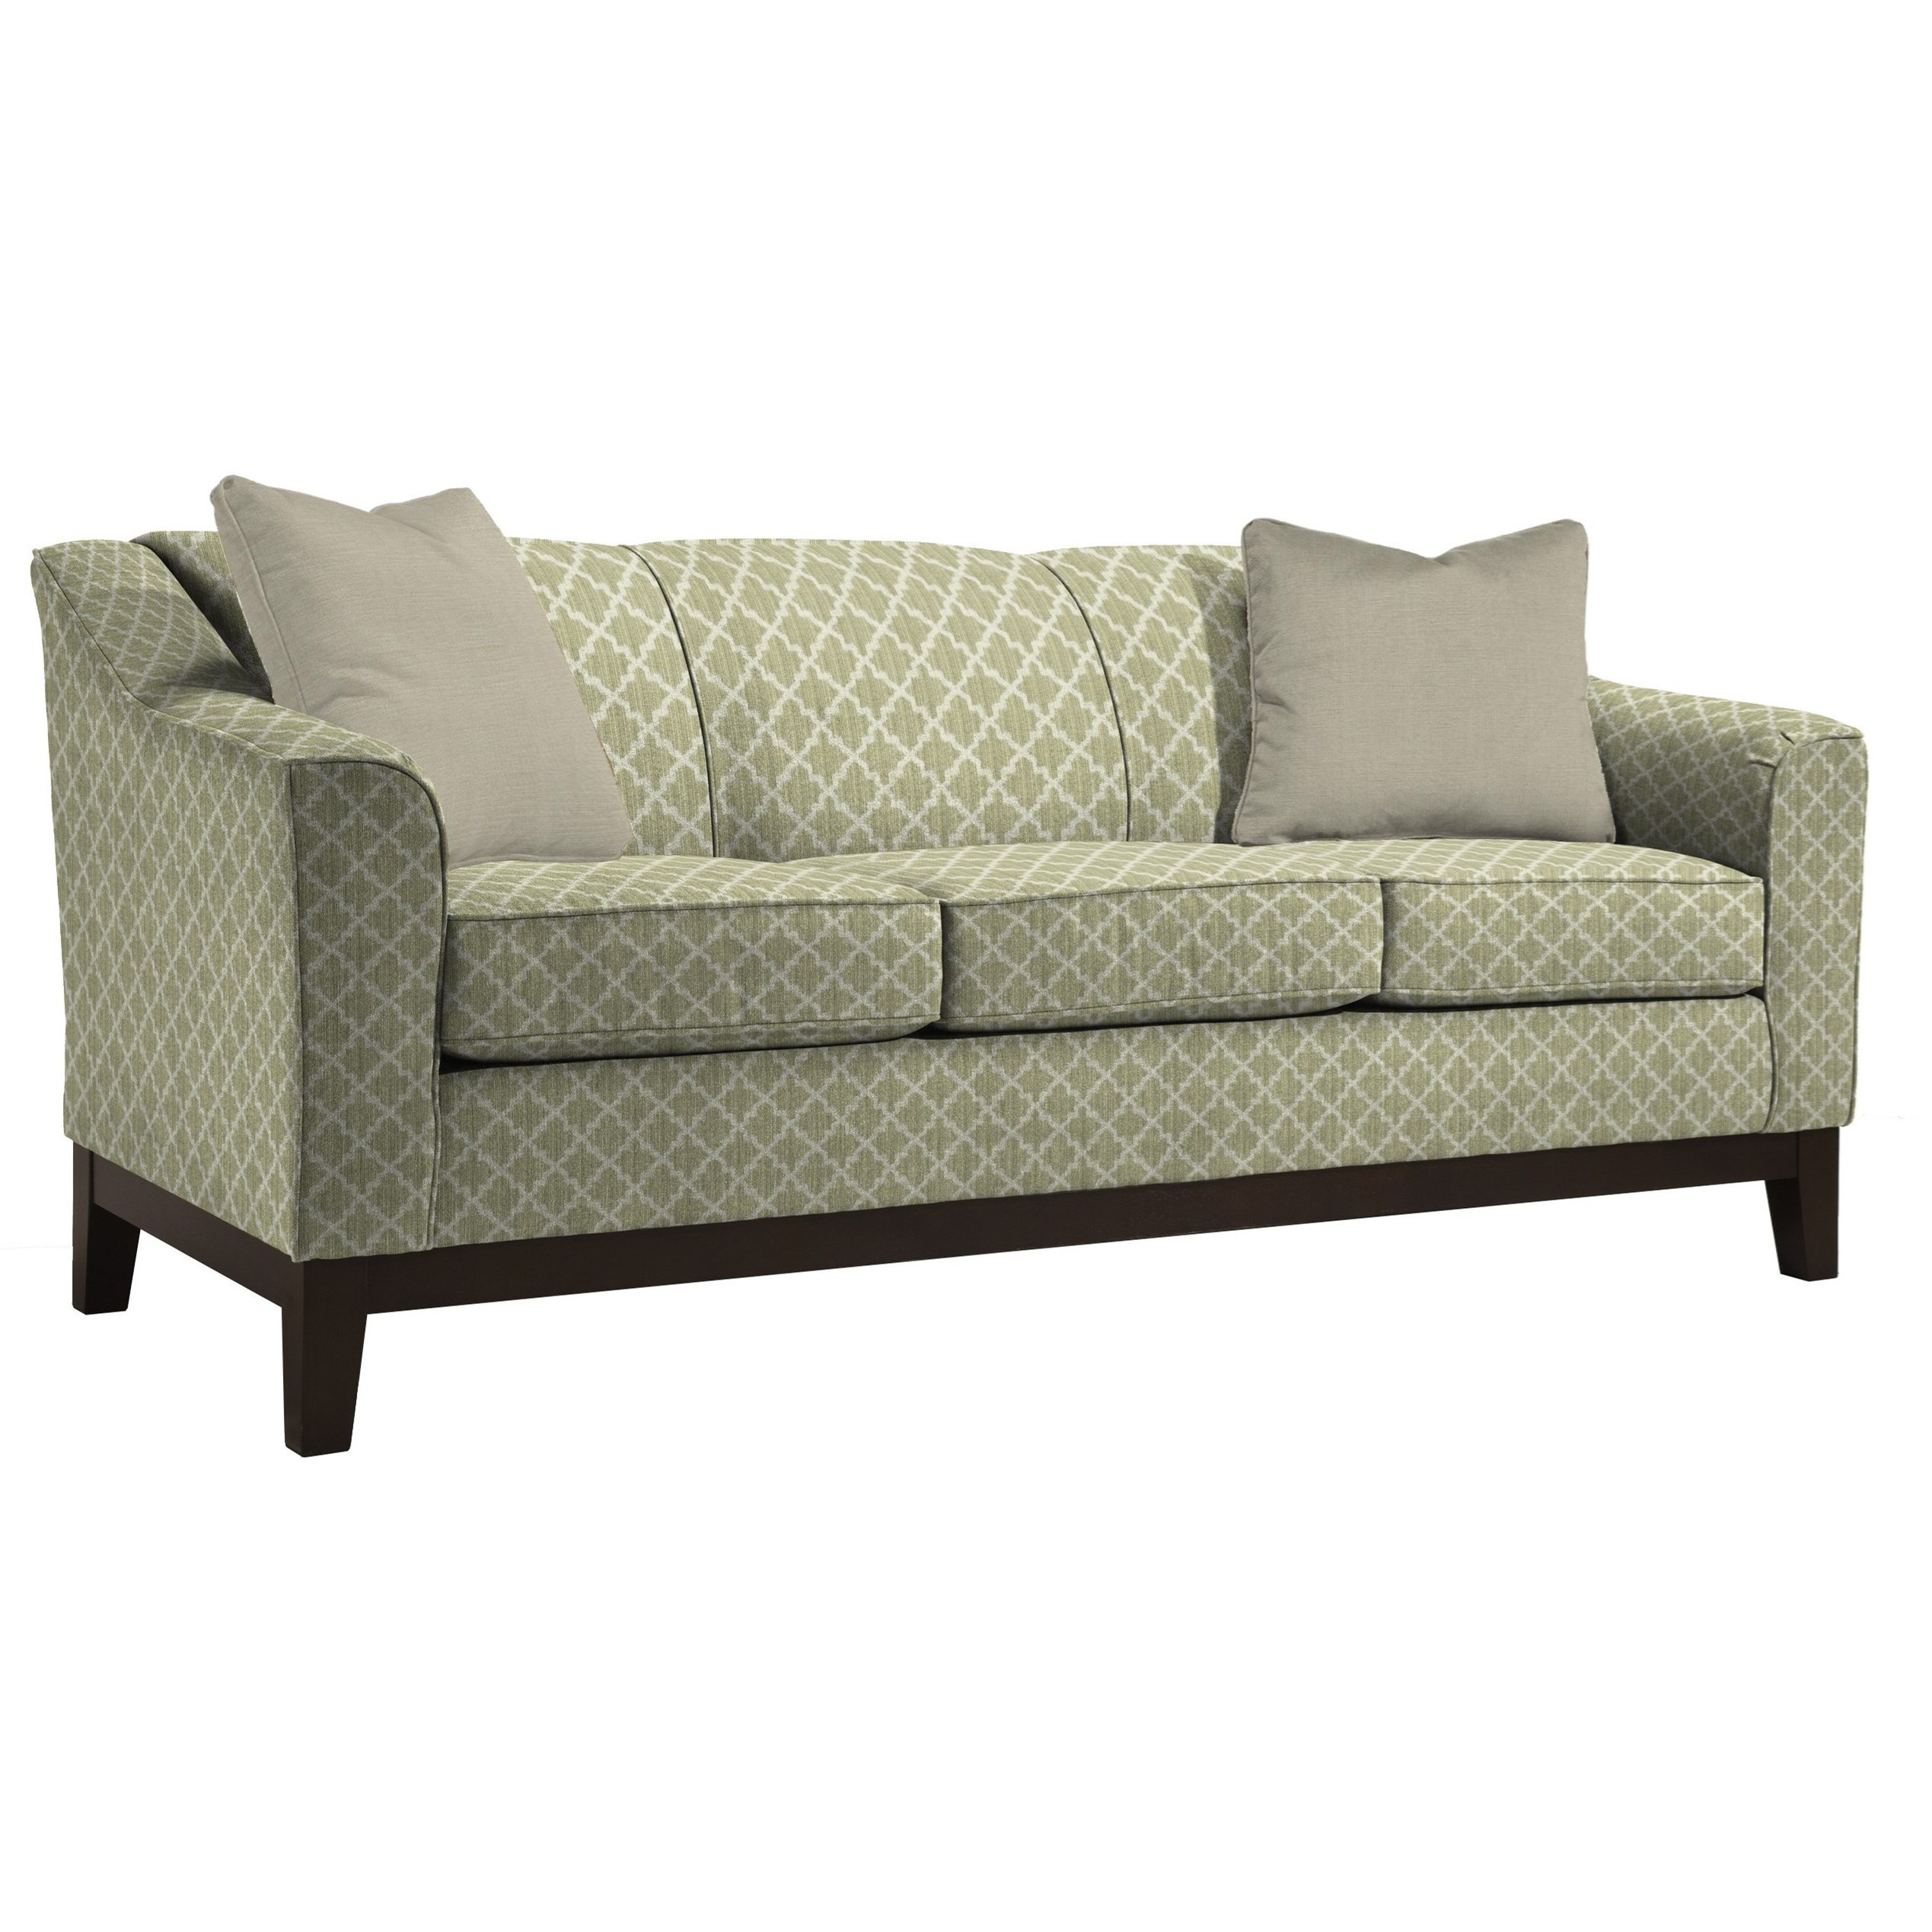 Best Home Furnishings Emeline Customizable Sofa - Item Number: 206338137-28841